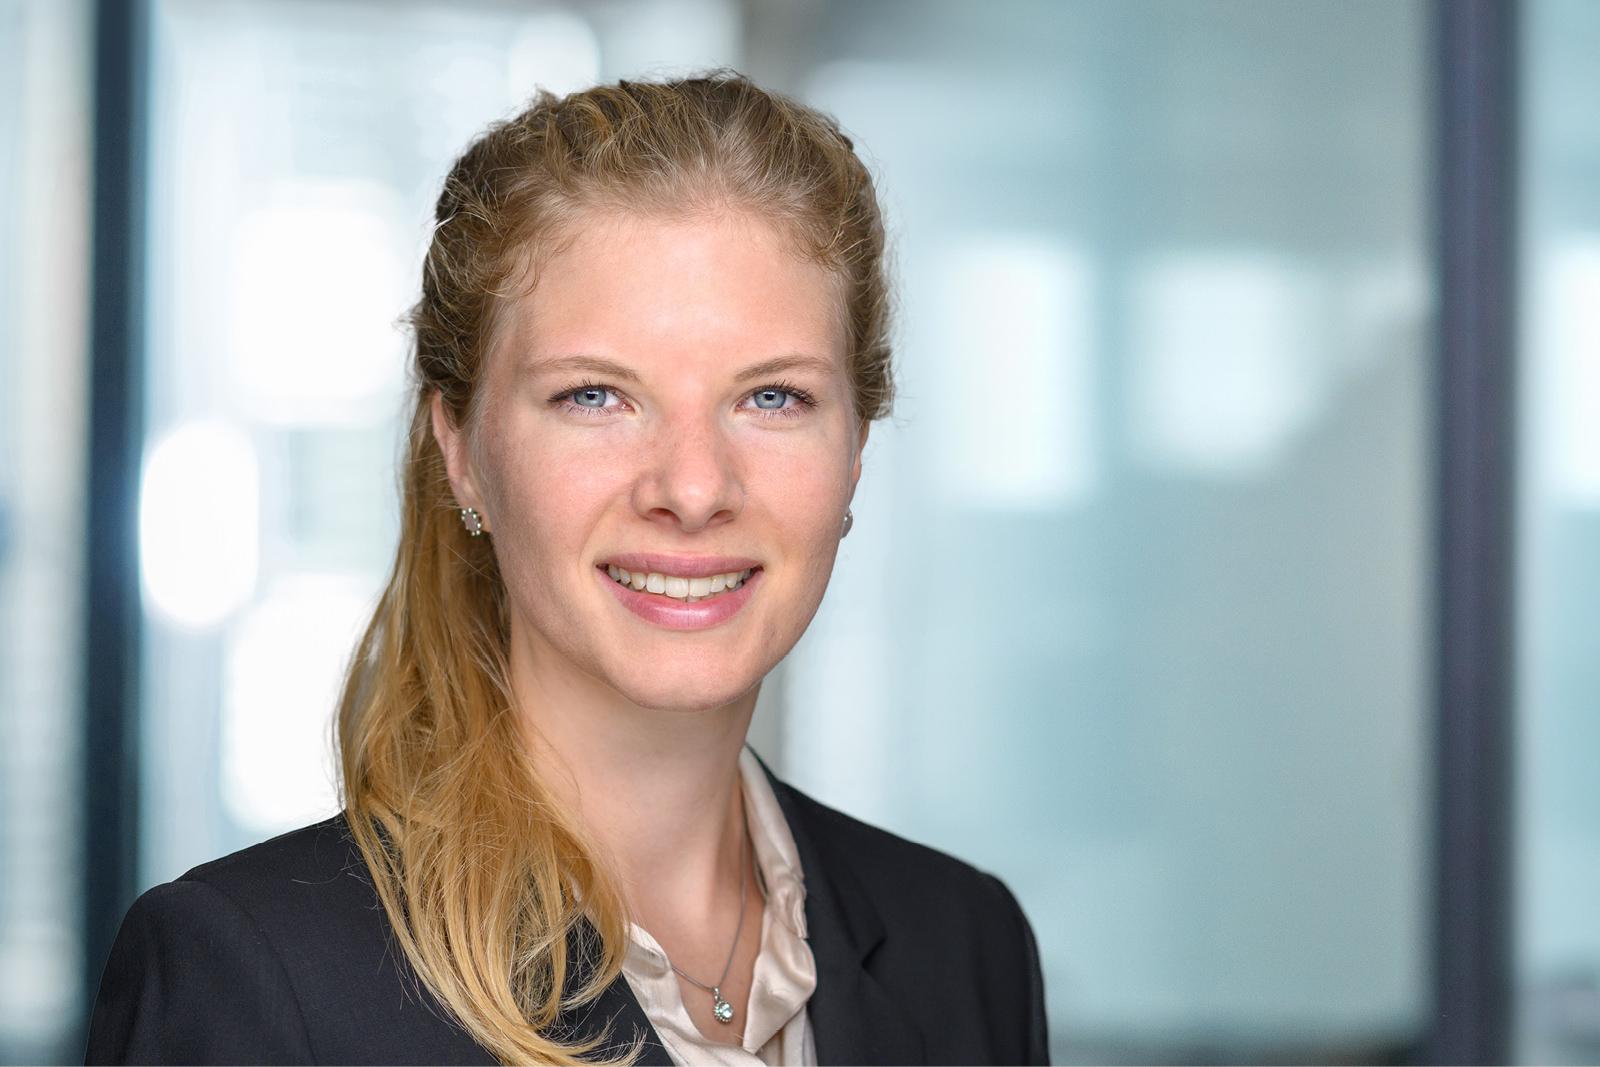 da professionals: Lina Dietiker